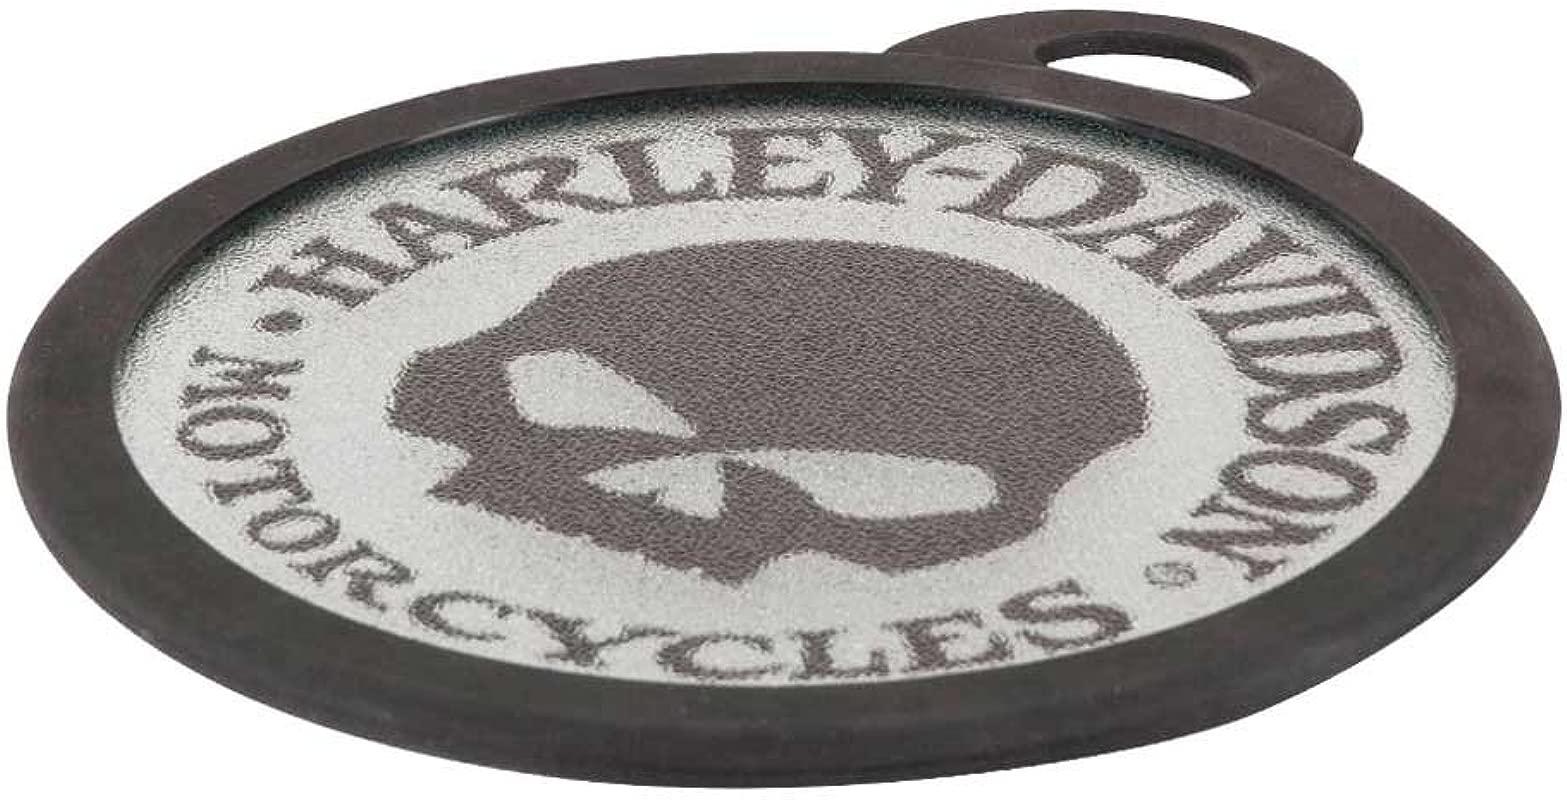 Harley Davidson Willie G Skull Glass Cutting Board HDL 18527